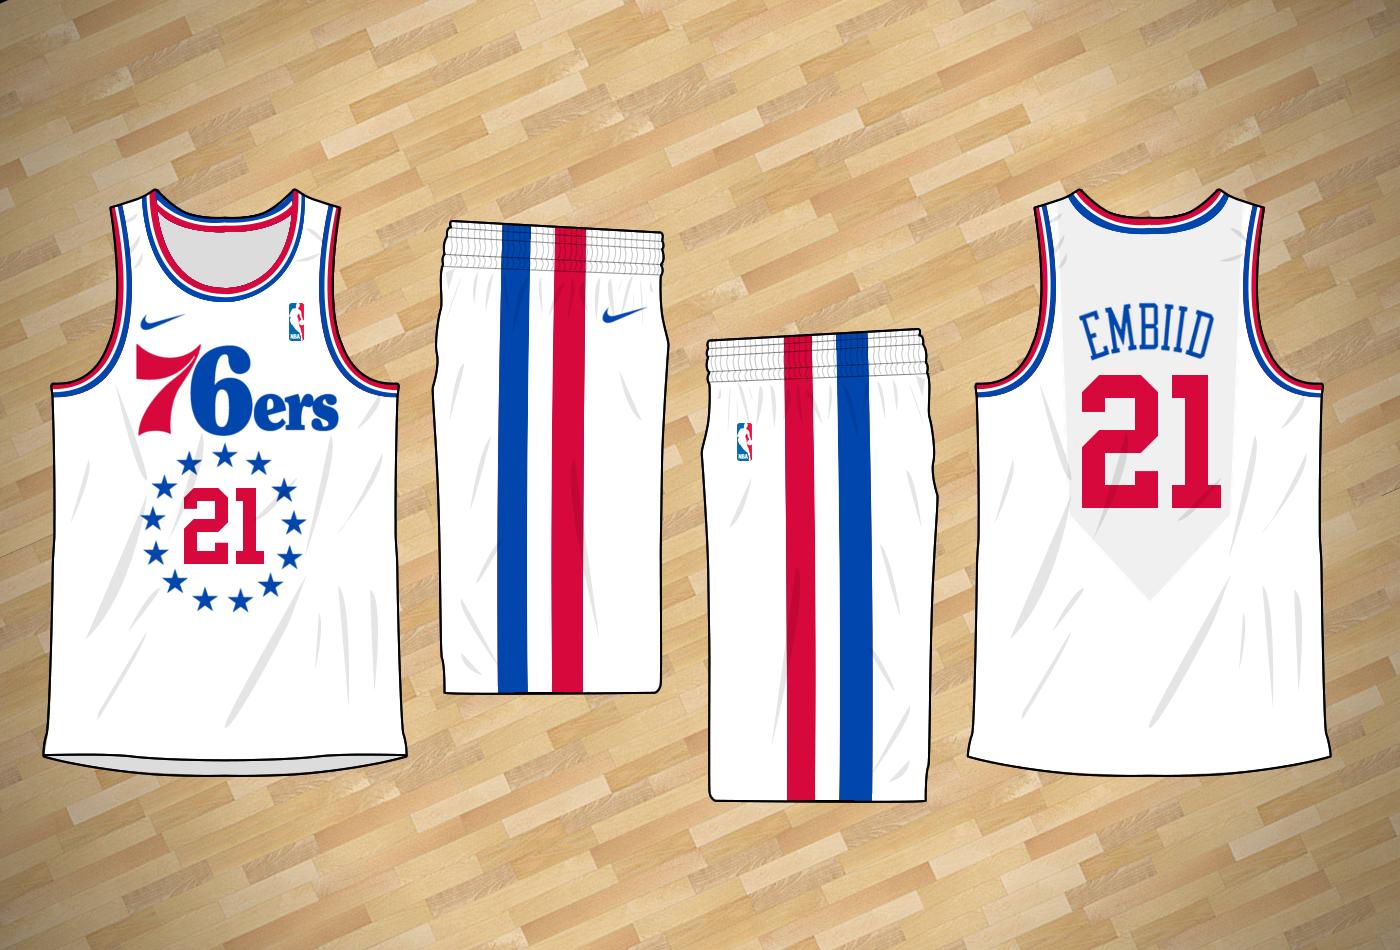 69b2fcdfb NIKE x NBA - Concepts - Chris Creamer s Sports Logos Community ...